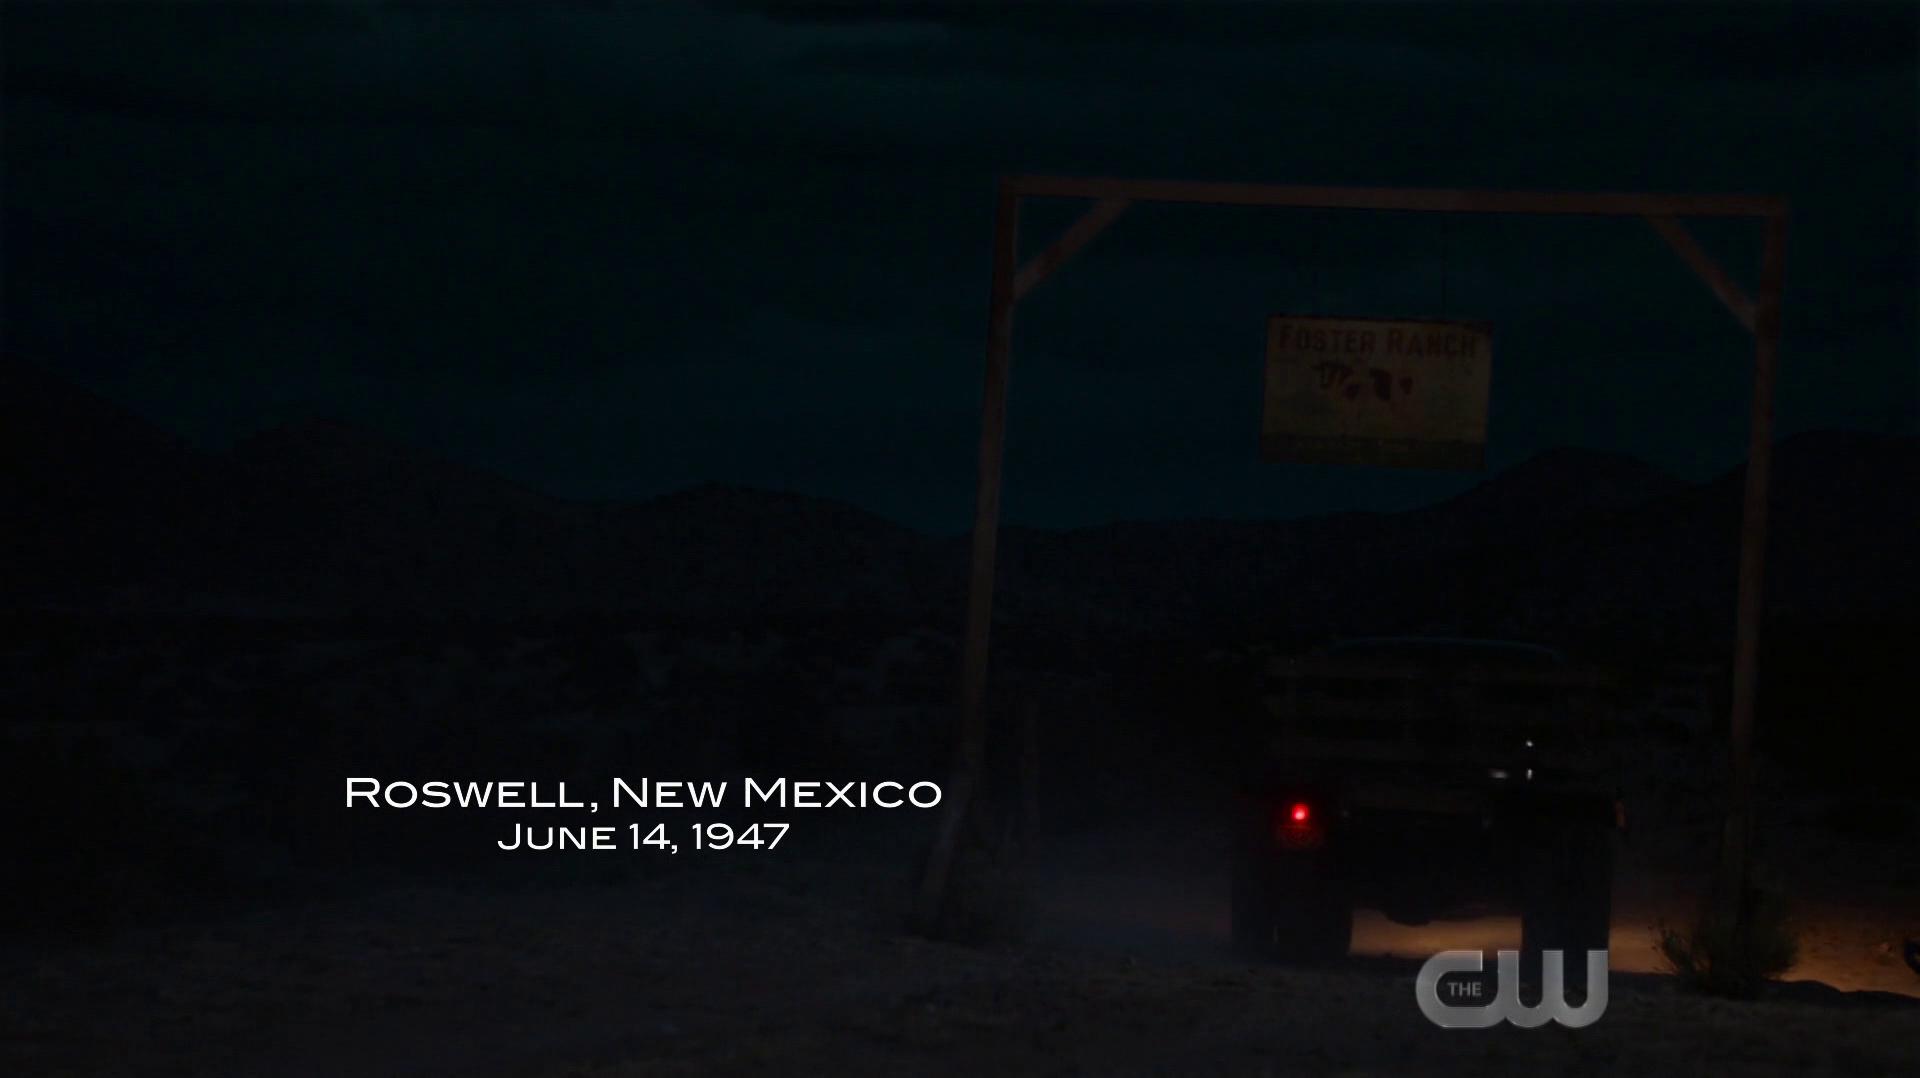 Roswell New Mexico S01E12 1080p HDTV x264-LucidTV